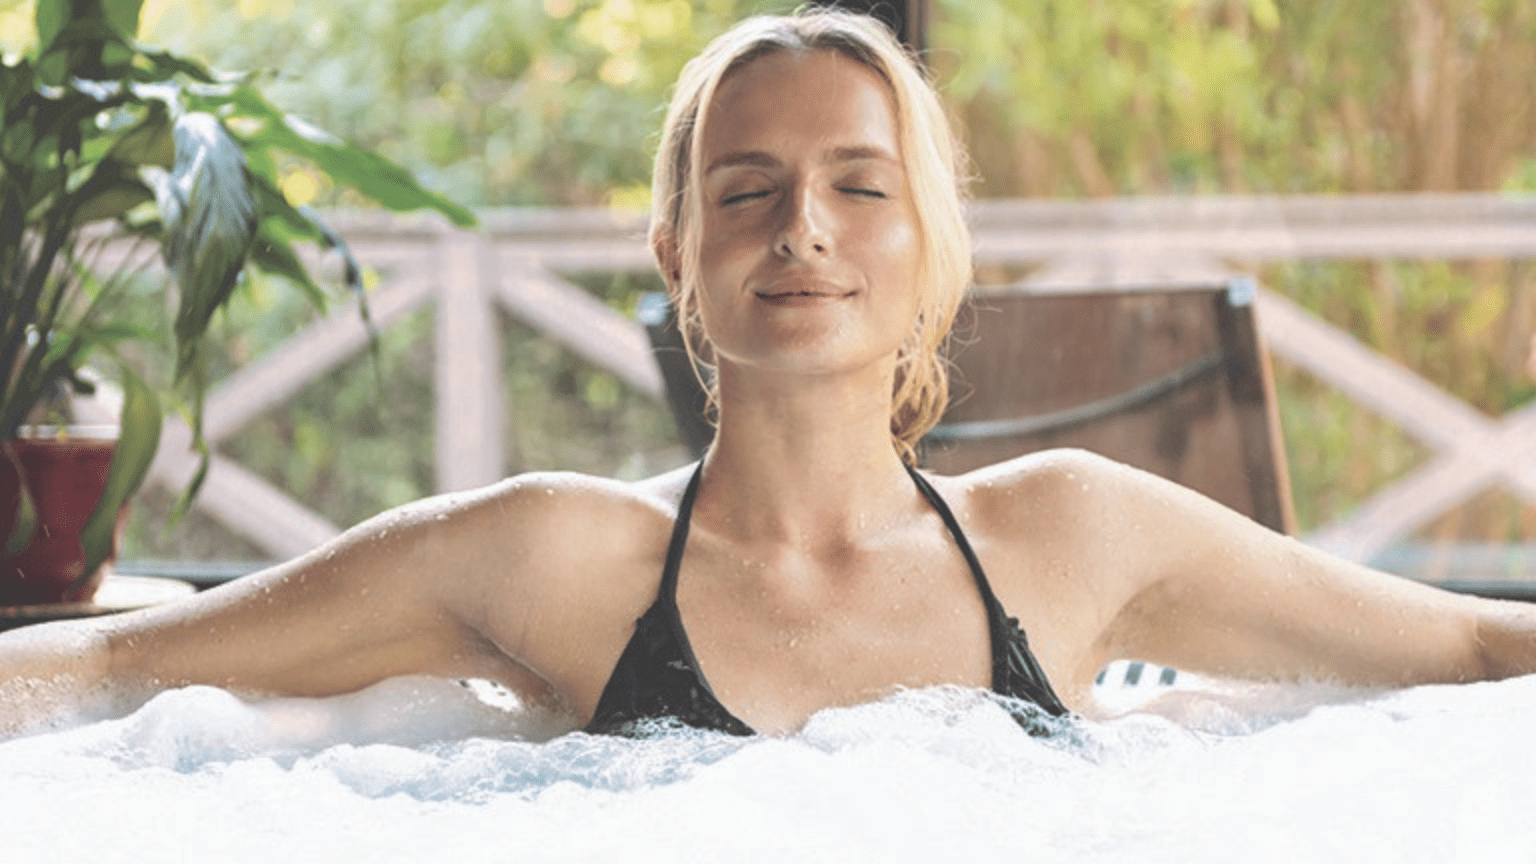 Bienfaits_du_spa-femme_zen-spa